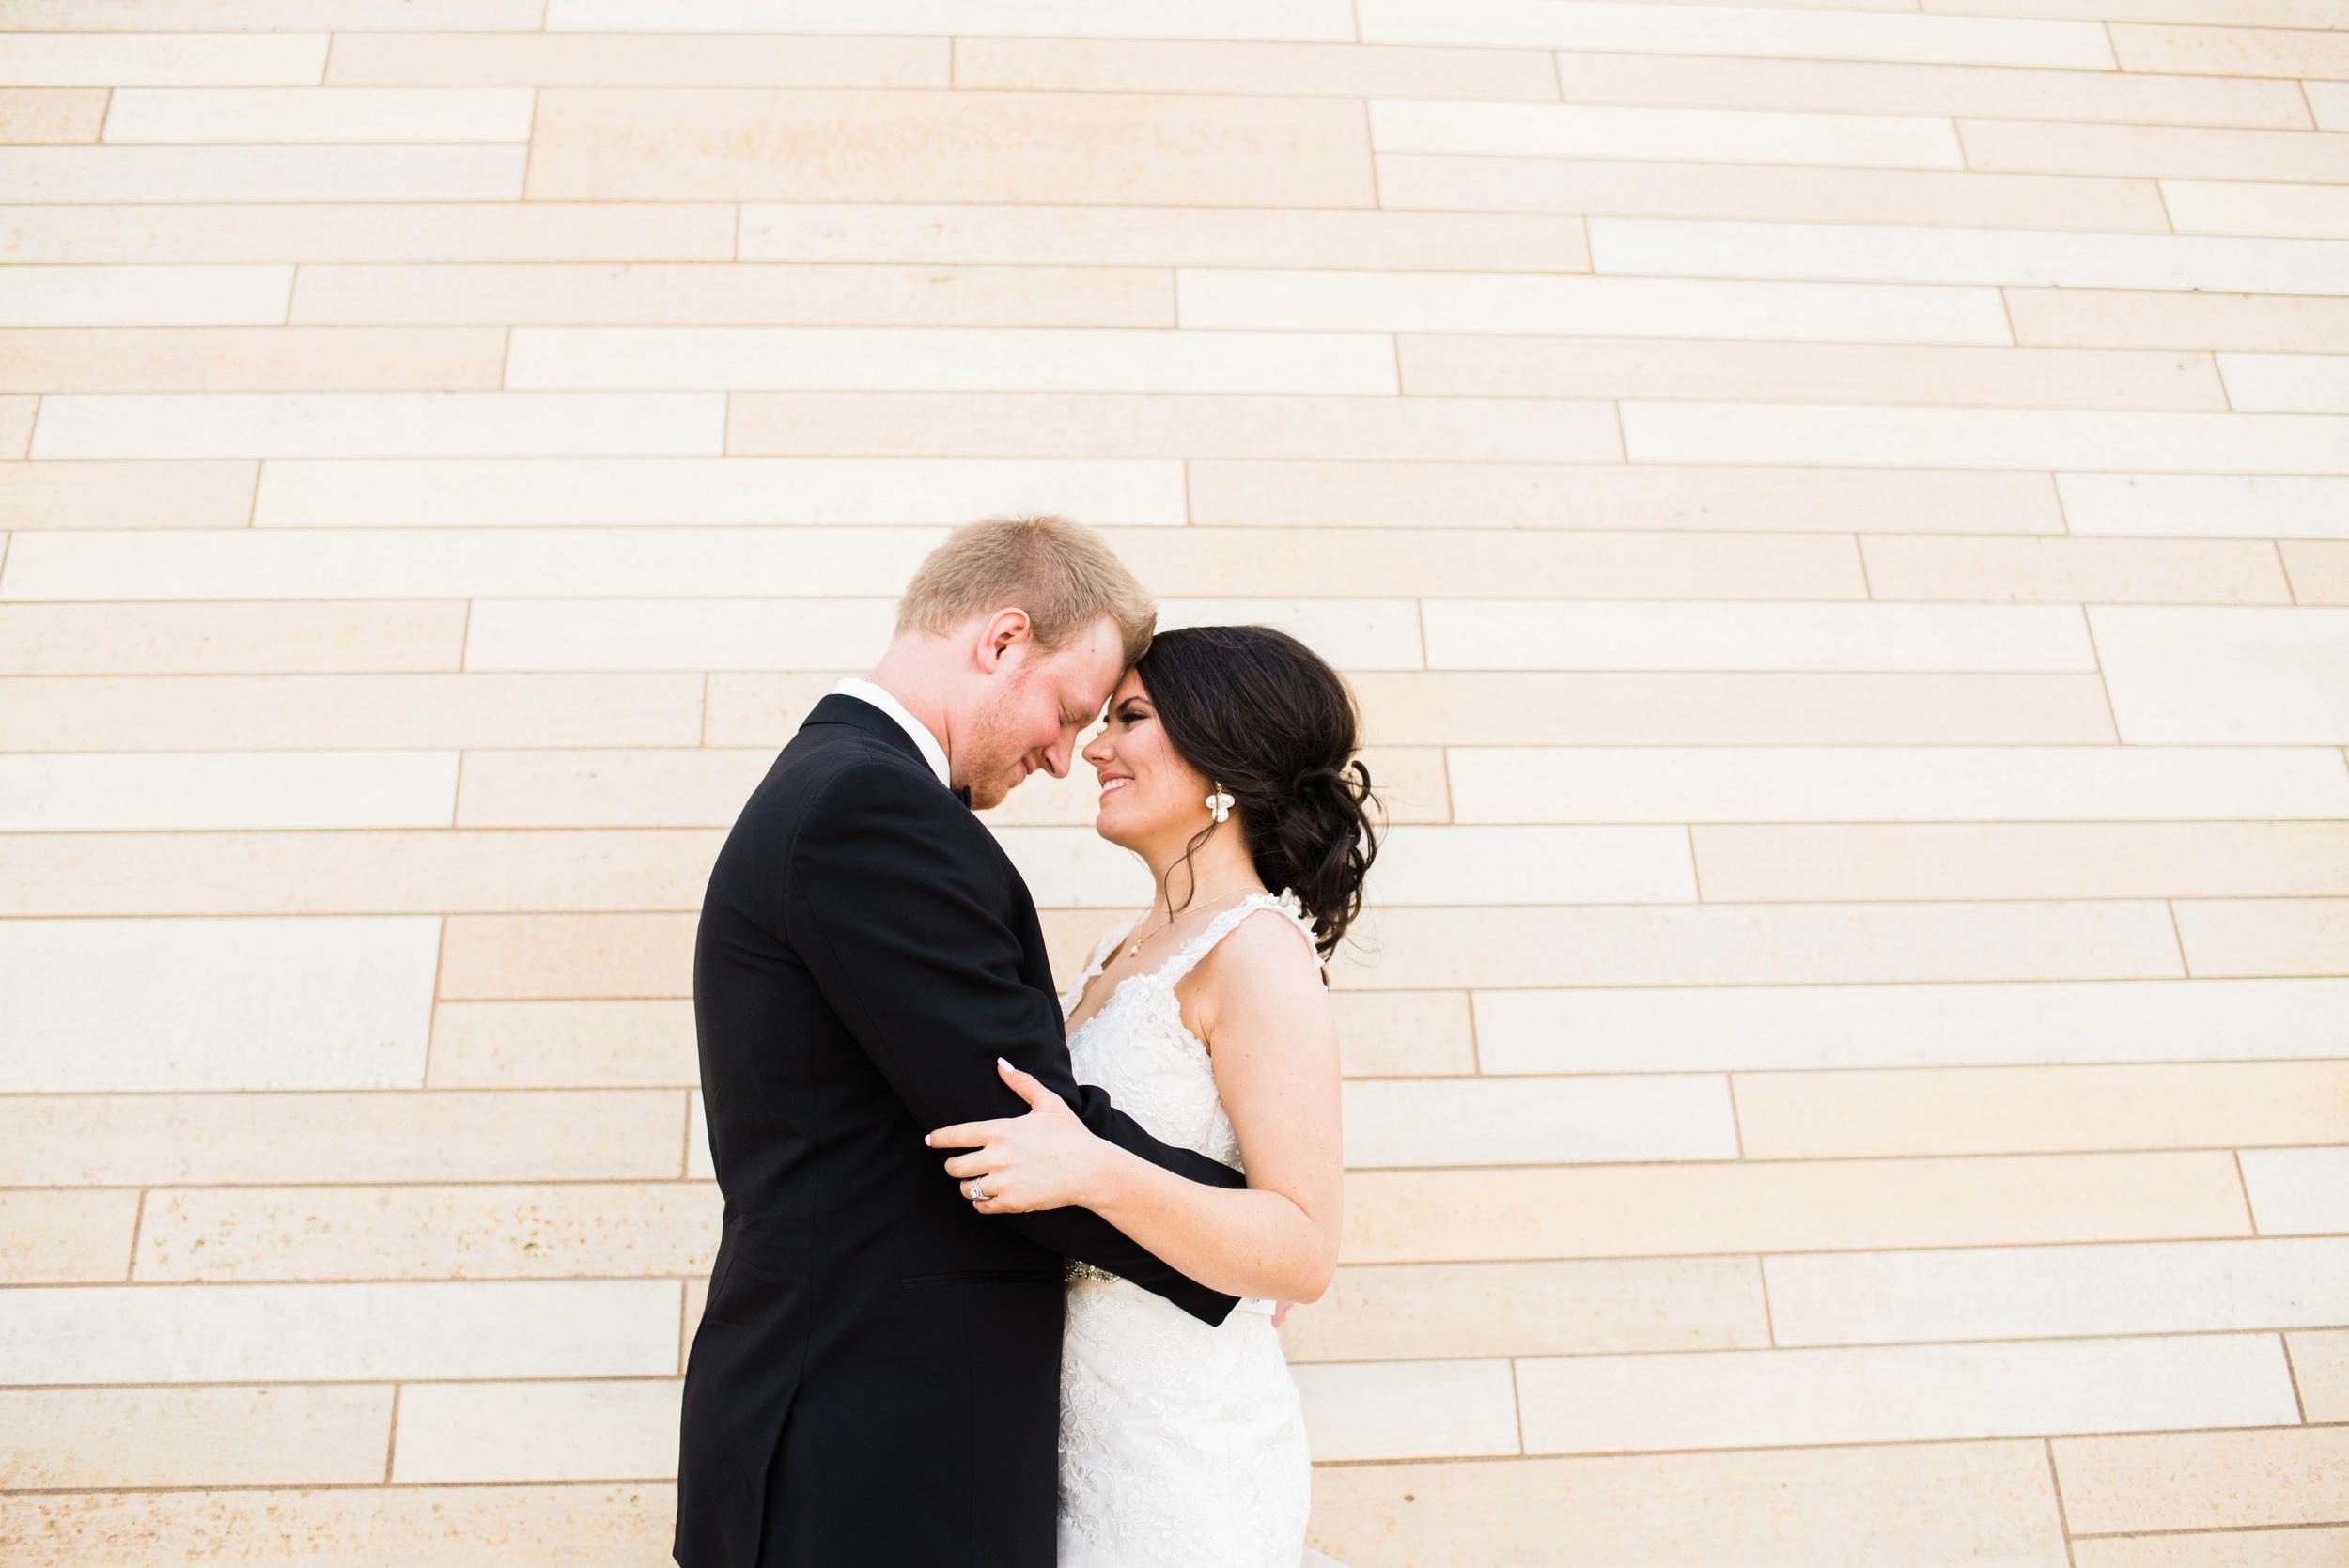 Downtown Des Moines Wedding Photographer_2095.jpg